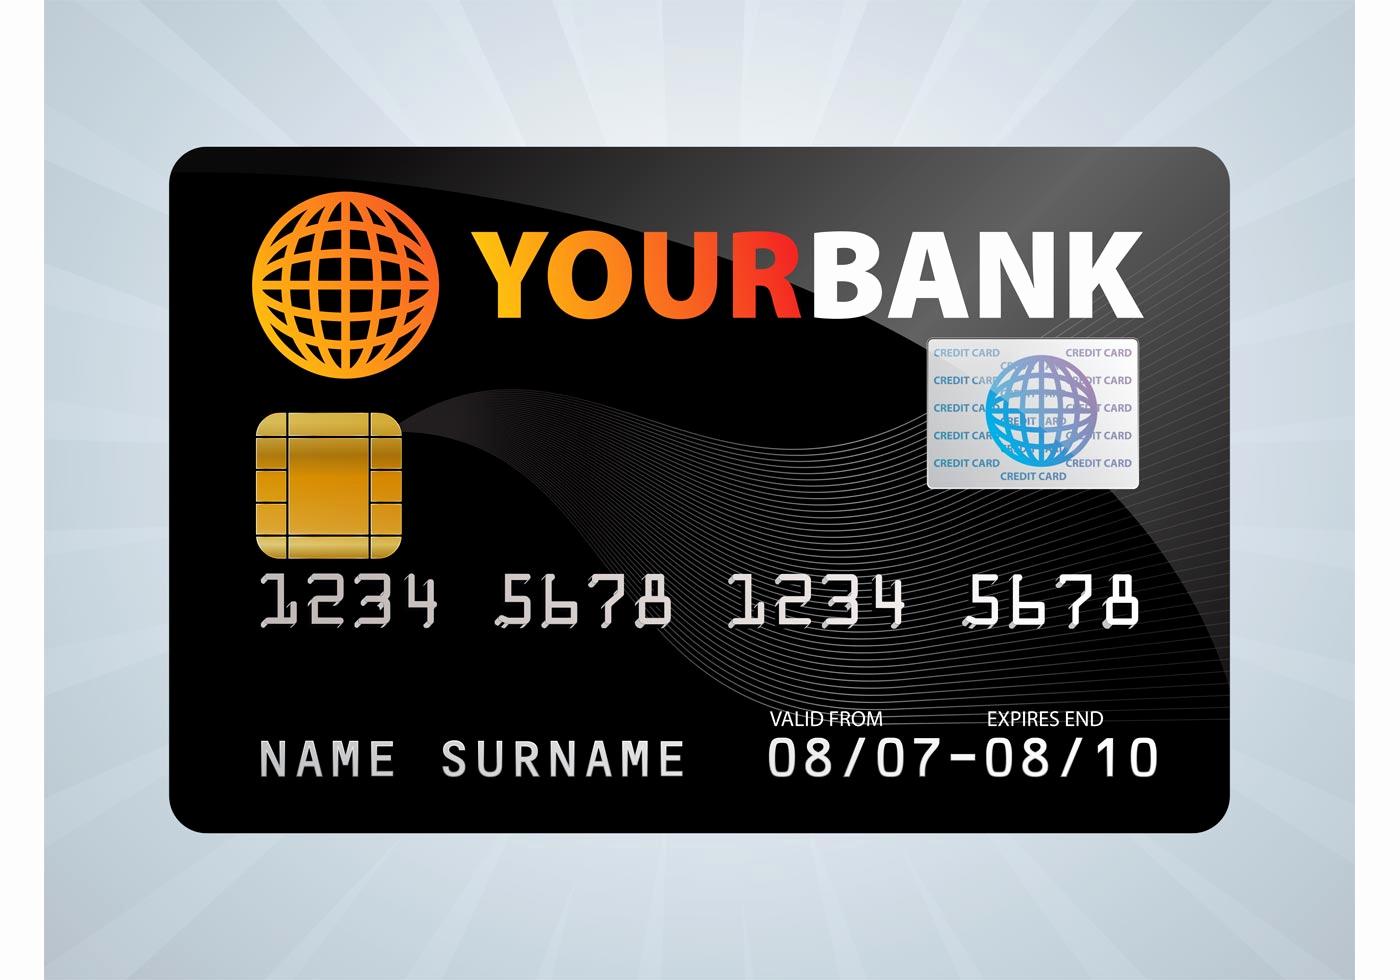 Discover Credit Card Designs Inspirational Credit Card Design Download Free Vector Art Stock